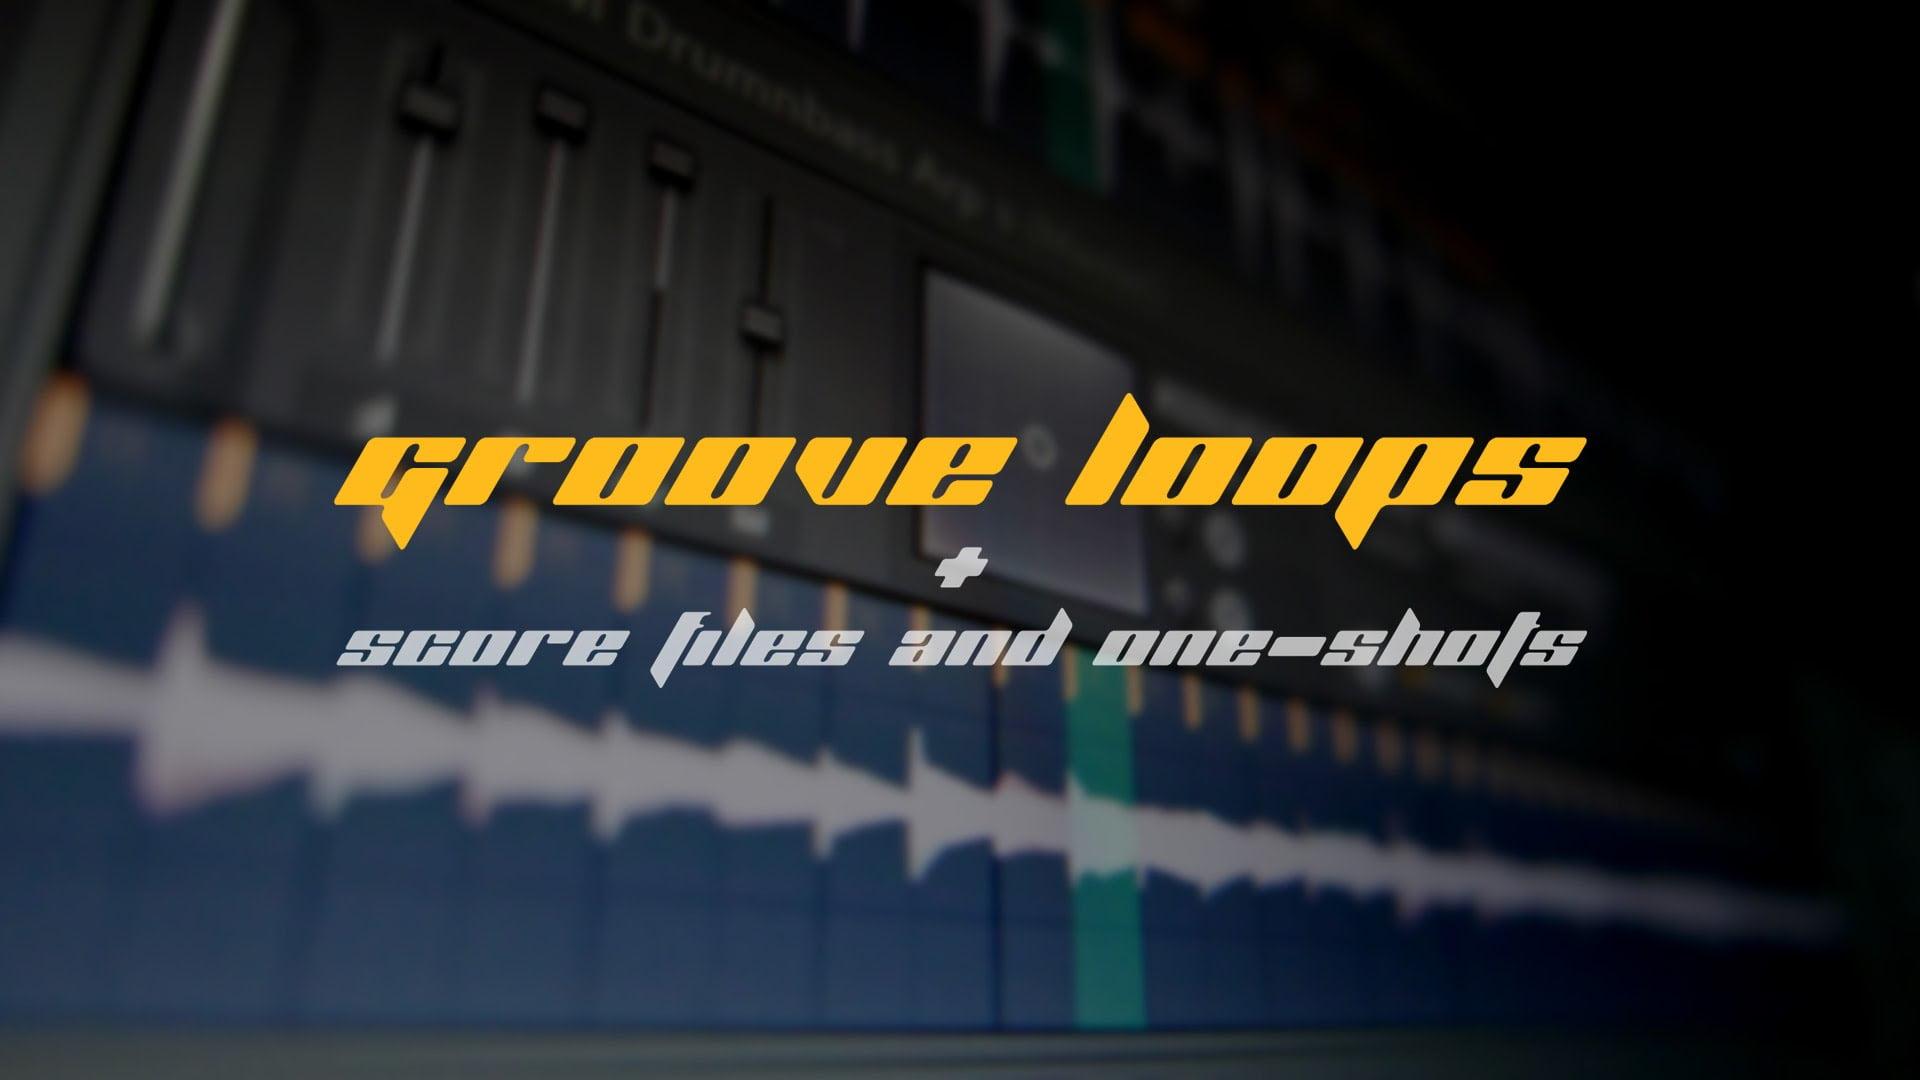 fl groove machine